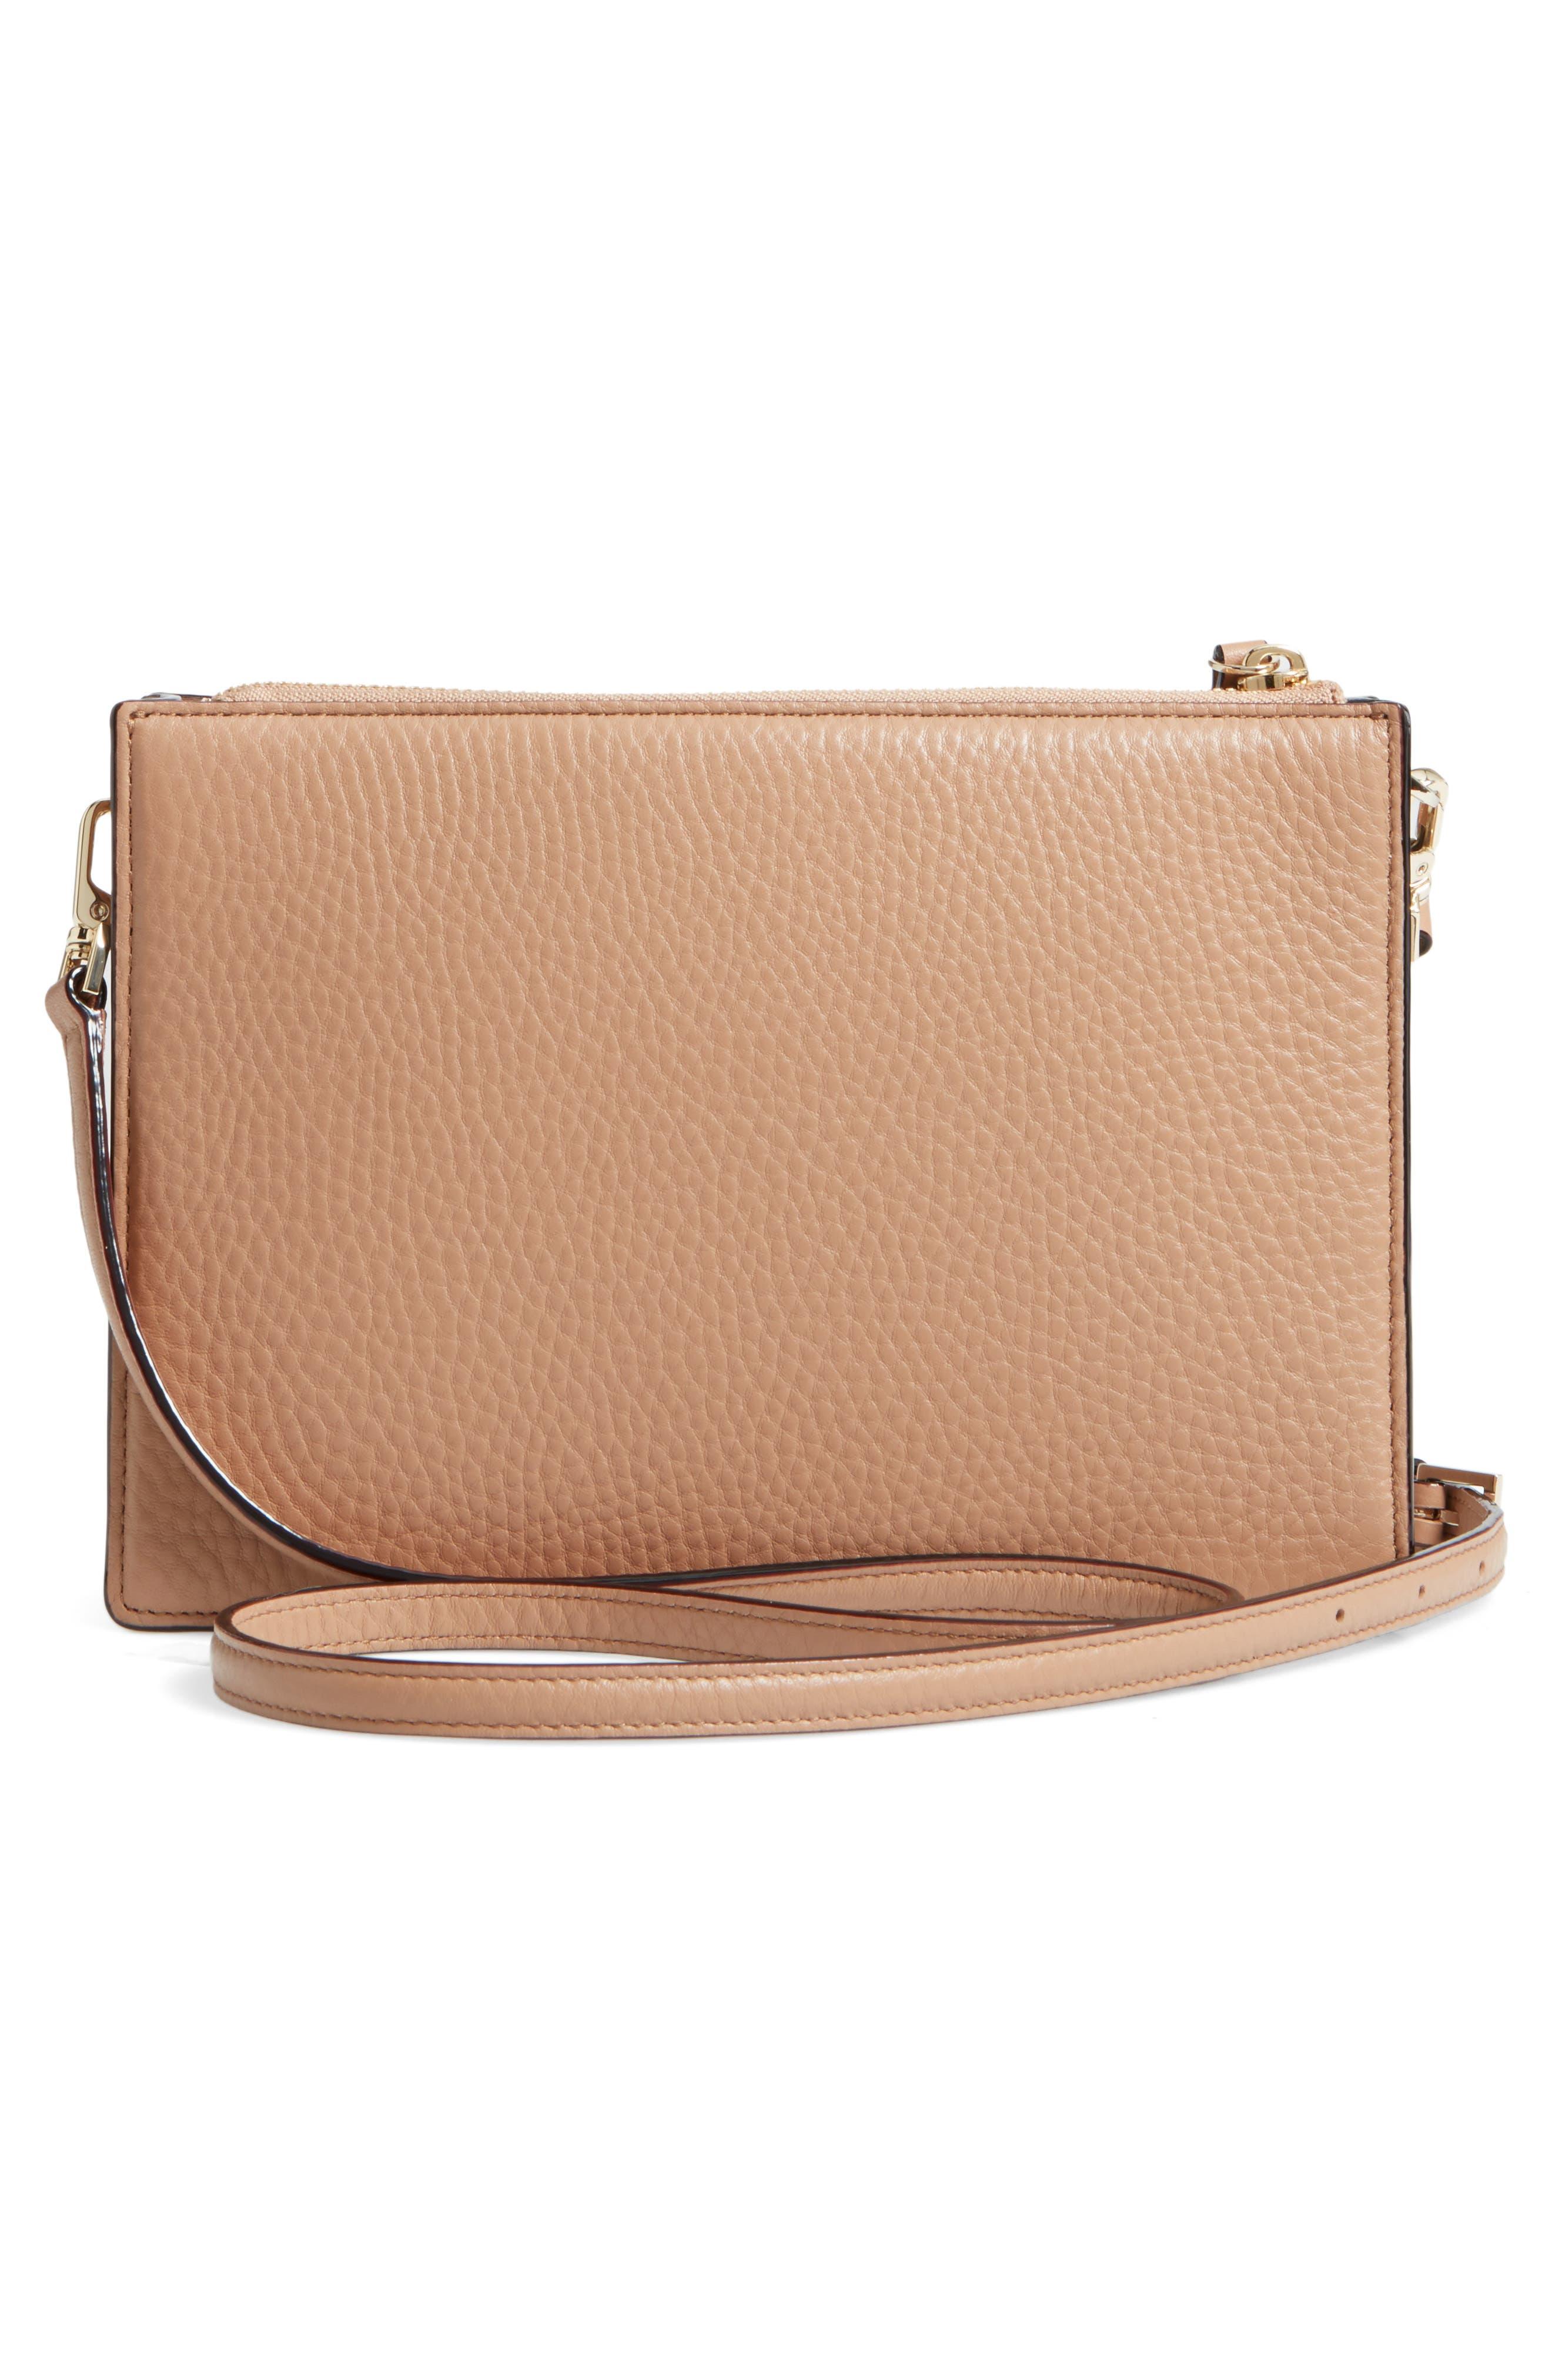 steward street clarise leather shoulder bag,                             Alternate thumbnail 8, color,